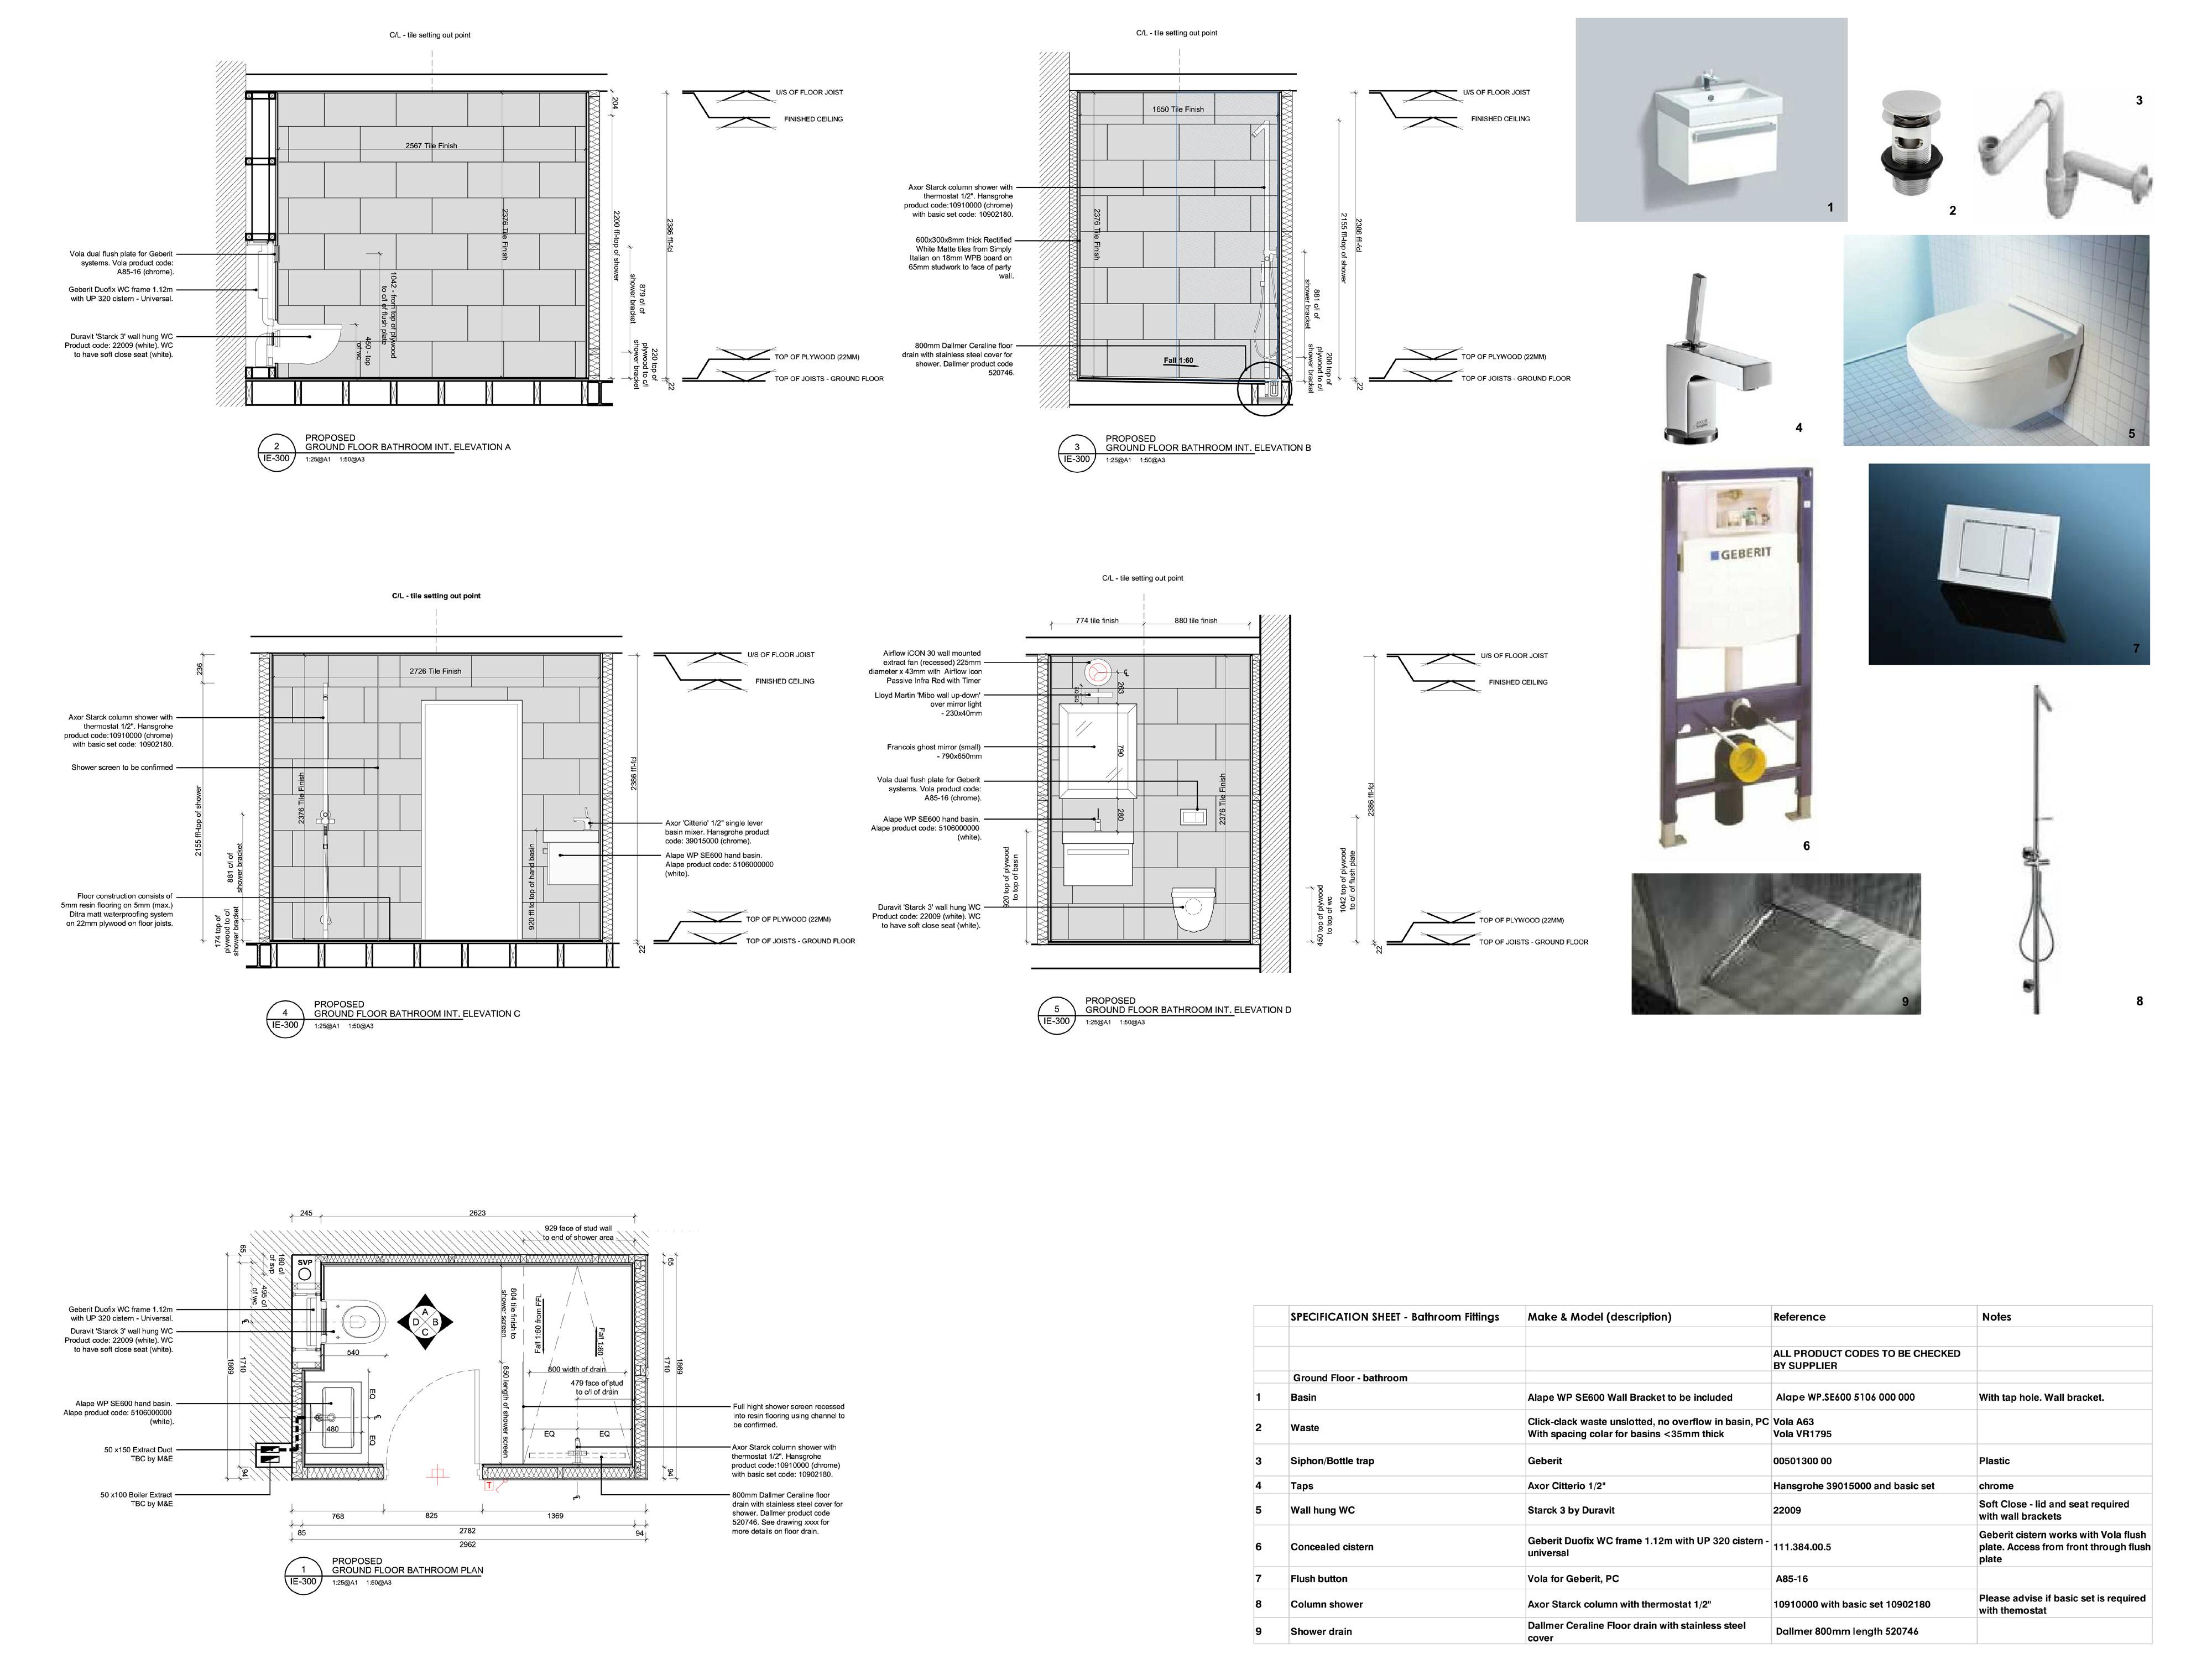 New loft plans at London property